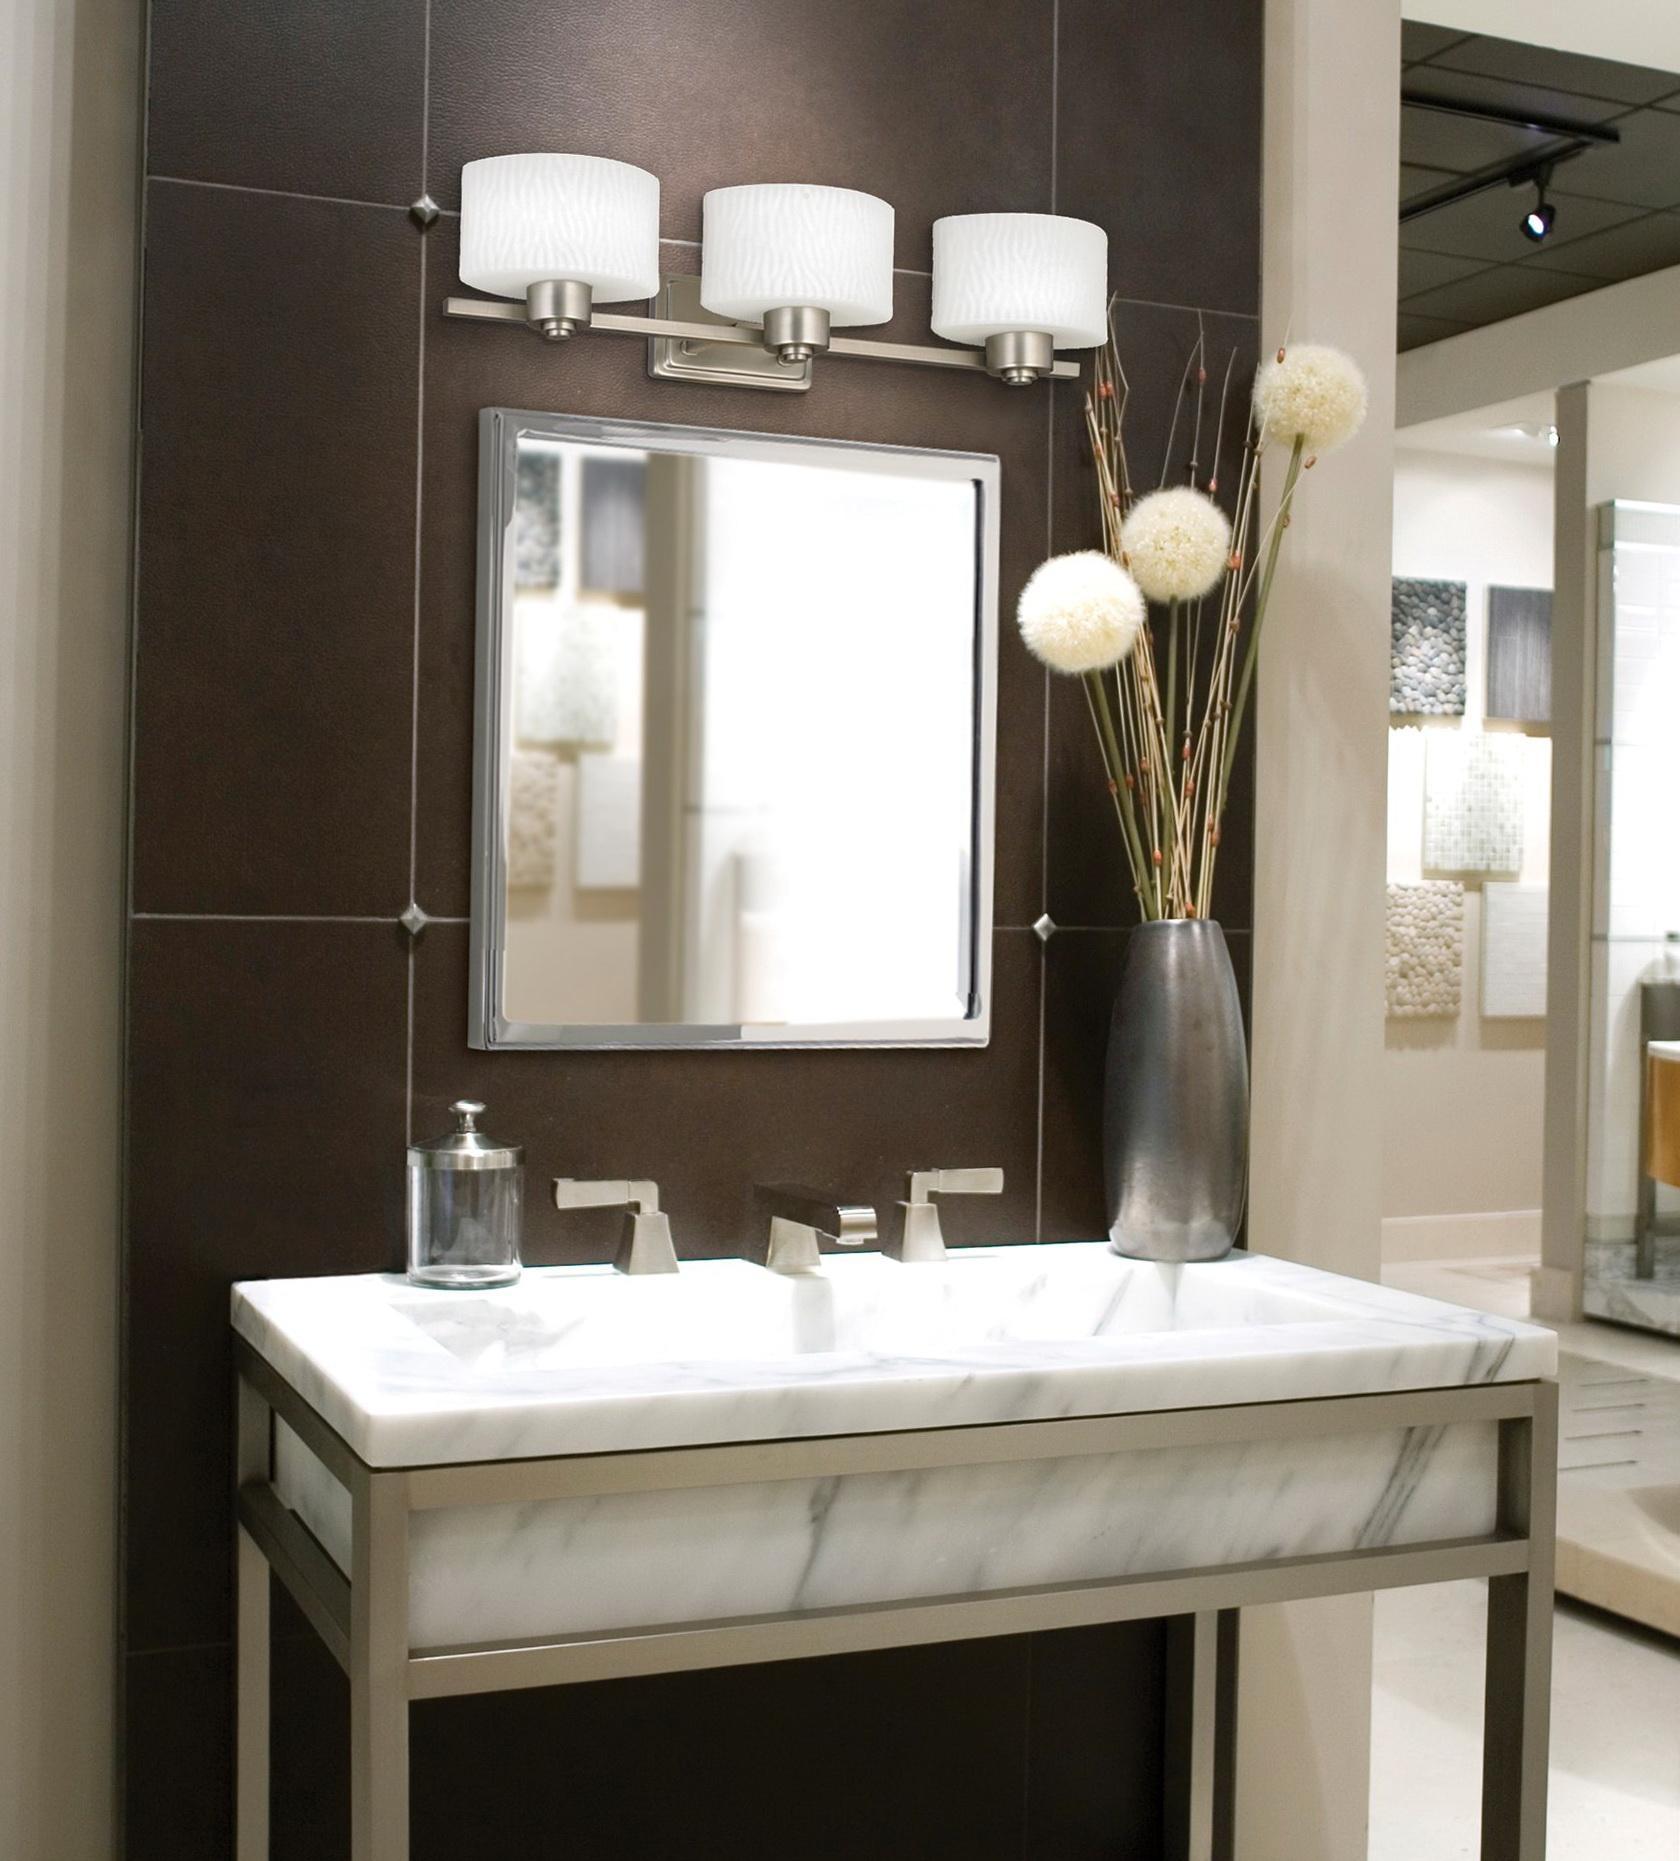 High Quality Wondrous Bathroom Vanity Mirrors For Com Ideas Brushed Nickel Pertaining To Bathroom  Vanity Mirrors (Image